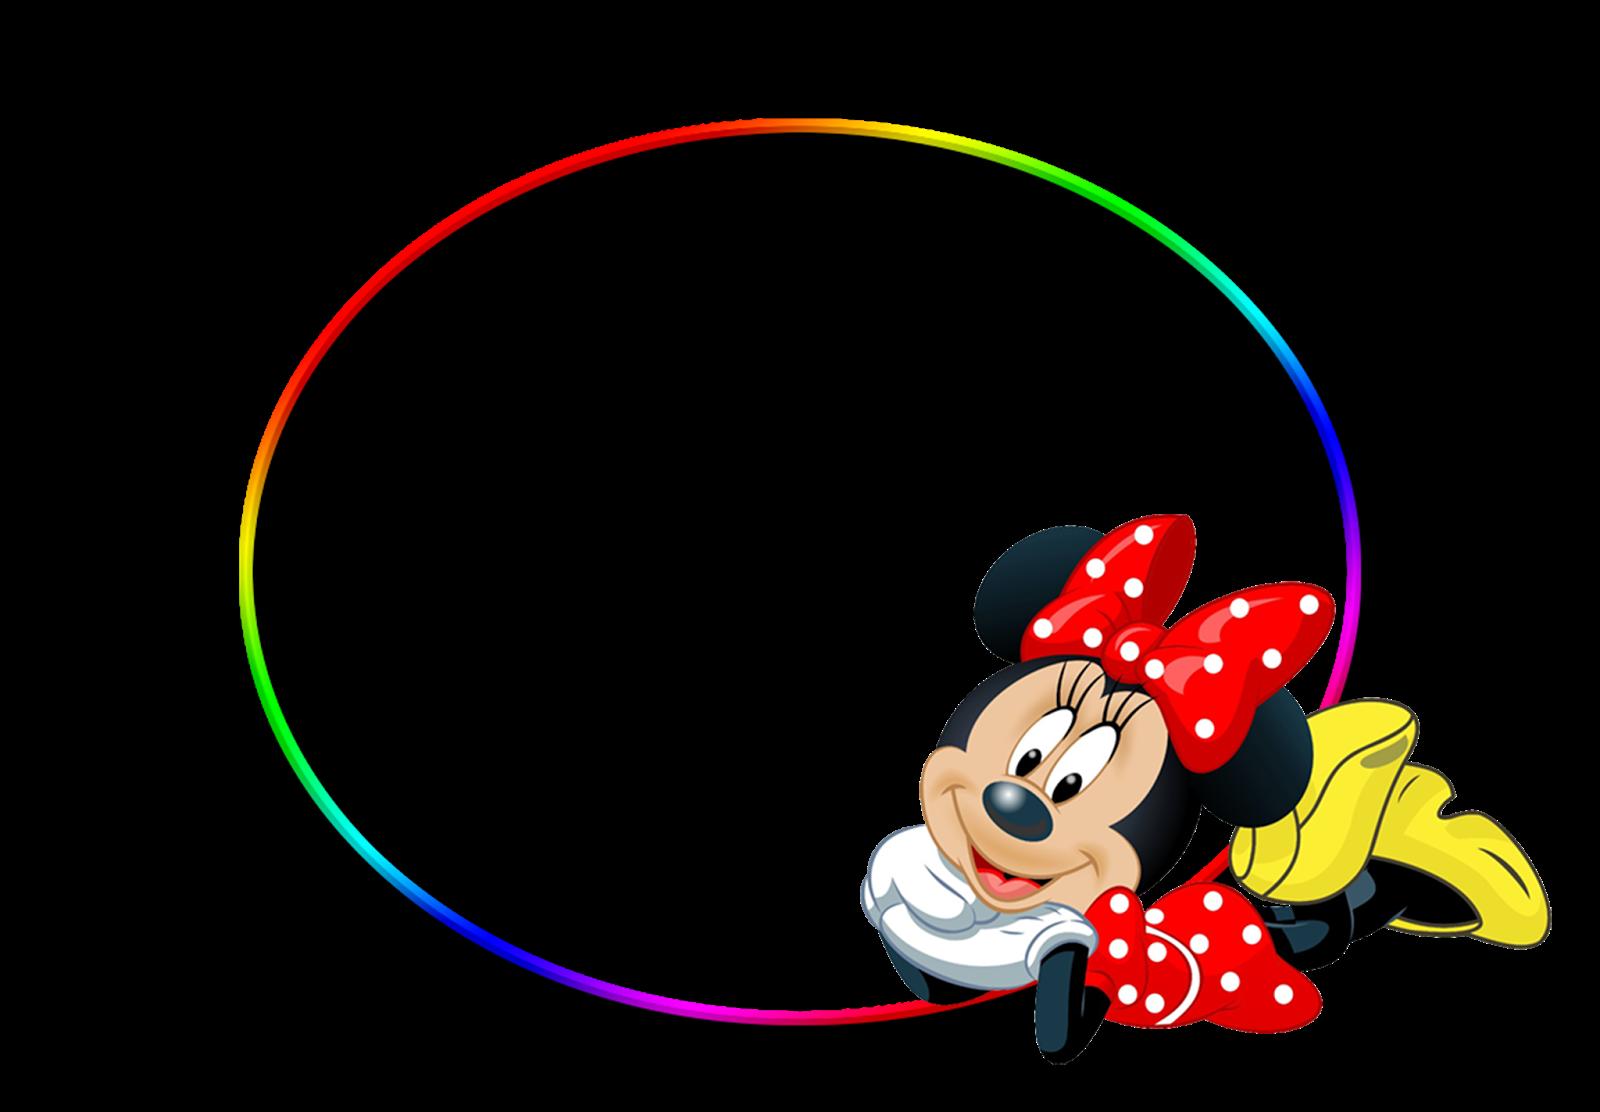 Molduras Png Simples Turma Do Mickey Mickey Png Fotos De